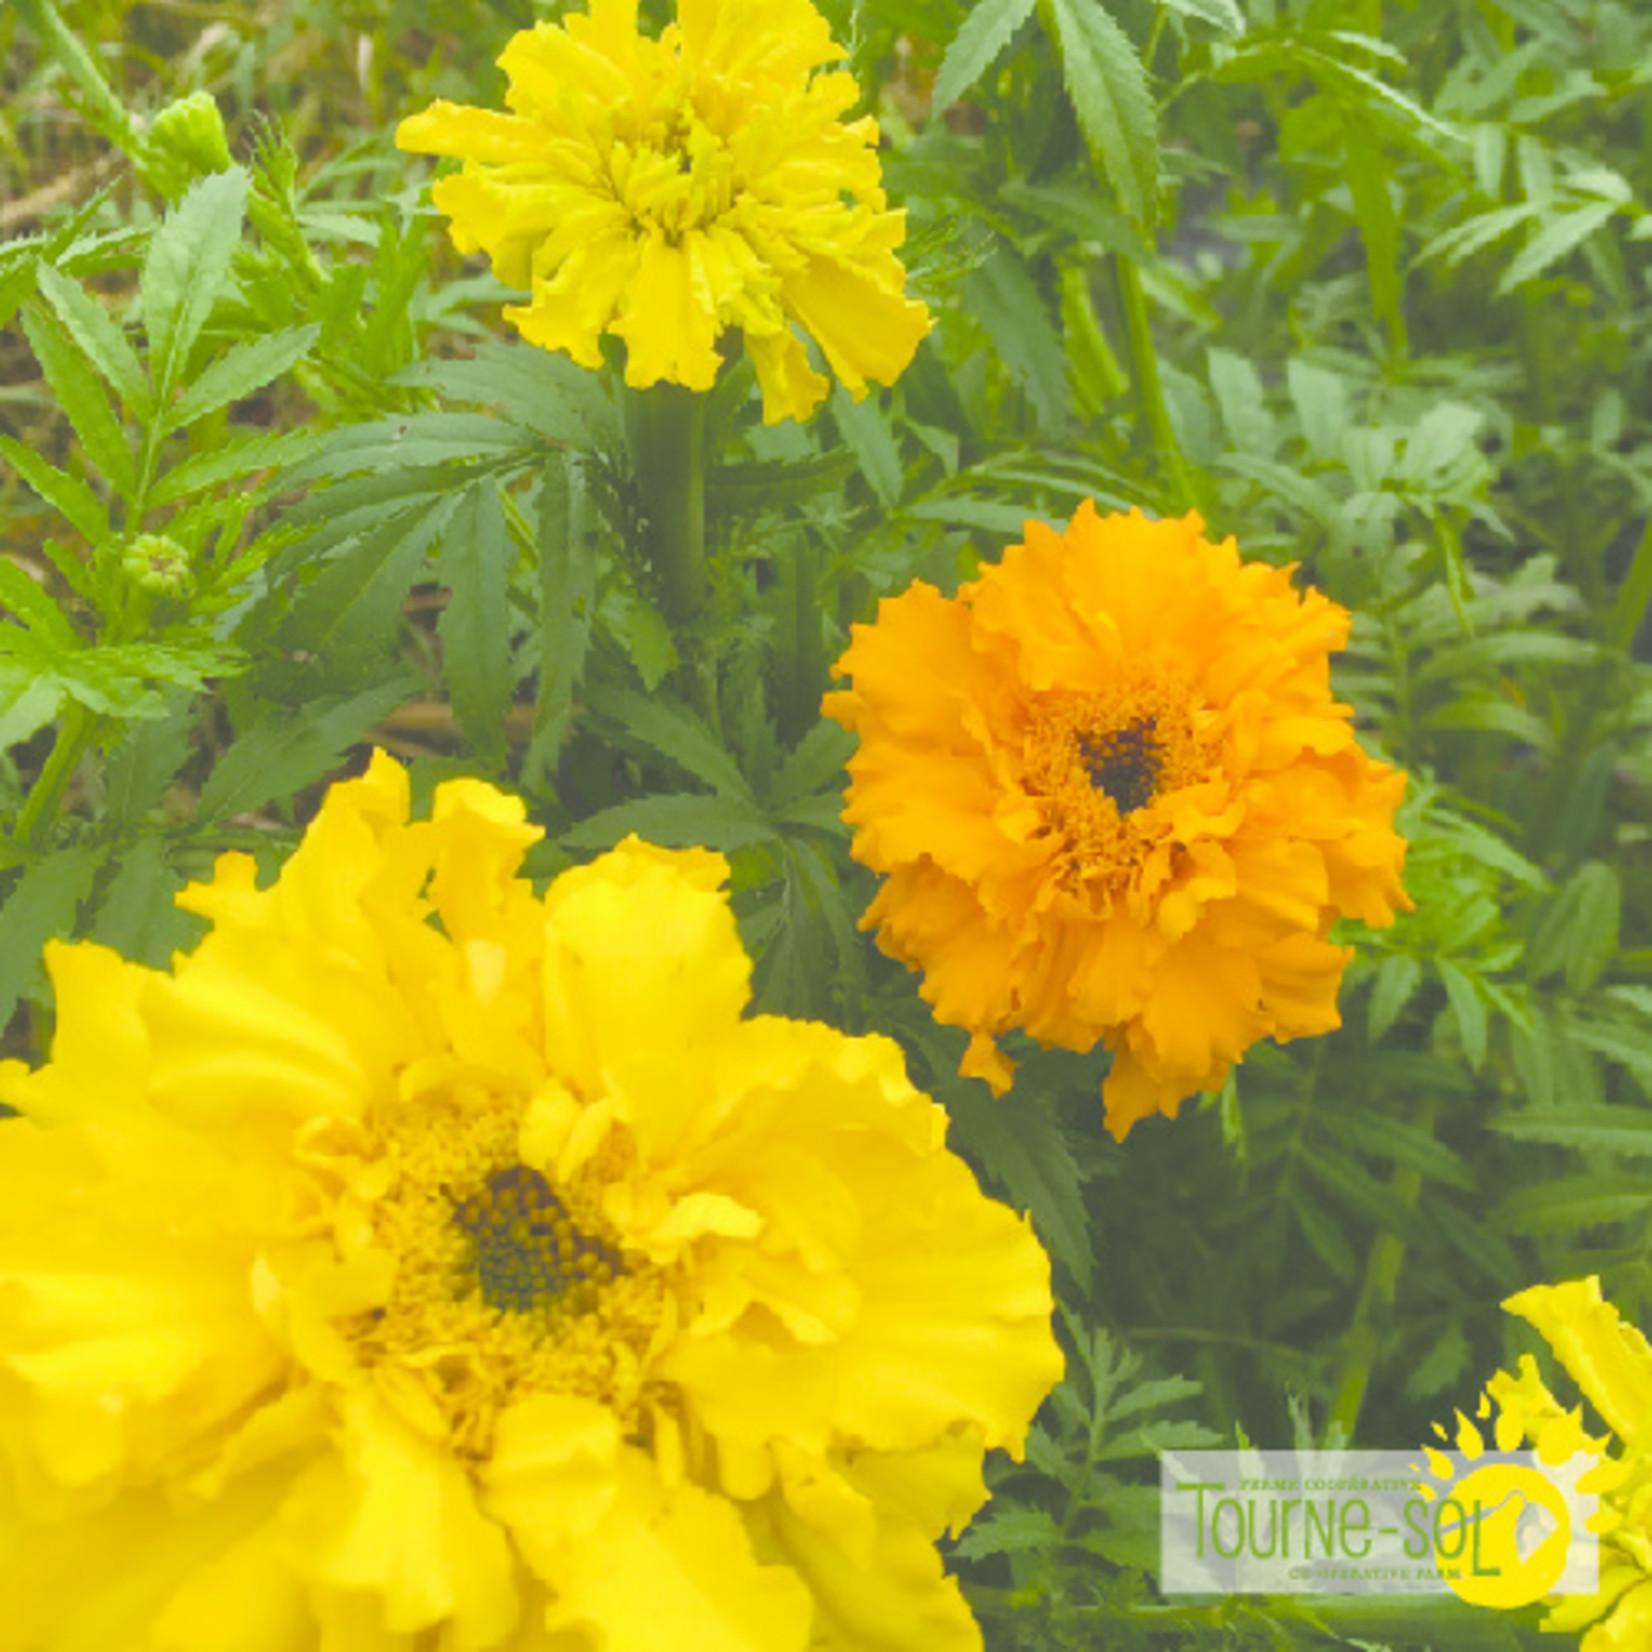 Tourne-Sol Crackerjack marigold